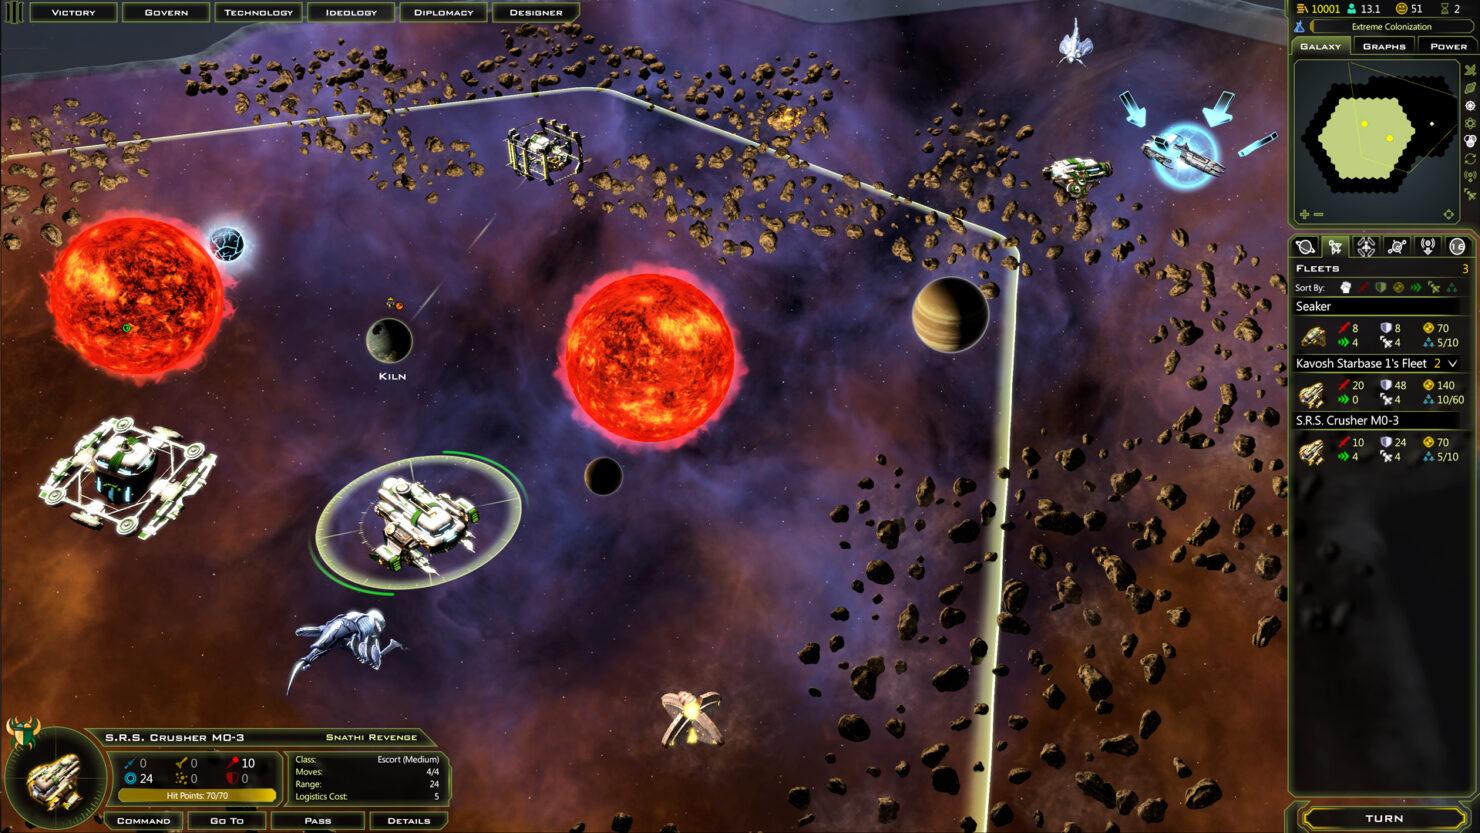 Galactic Civilizations III: Revenge of the Snathi